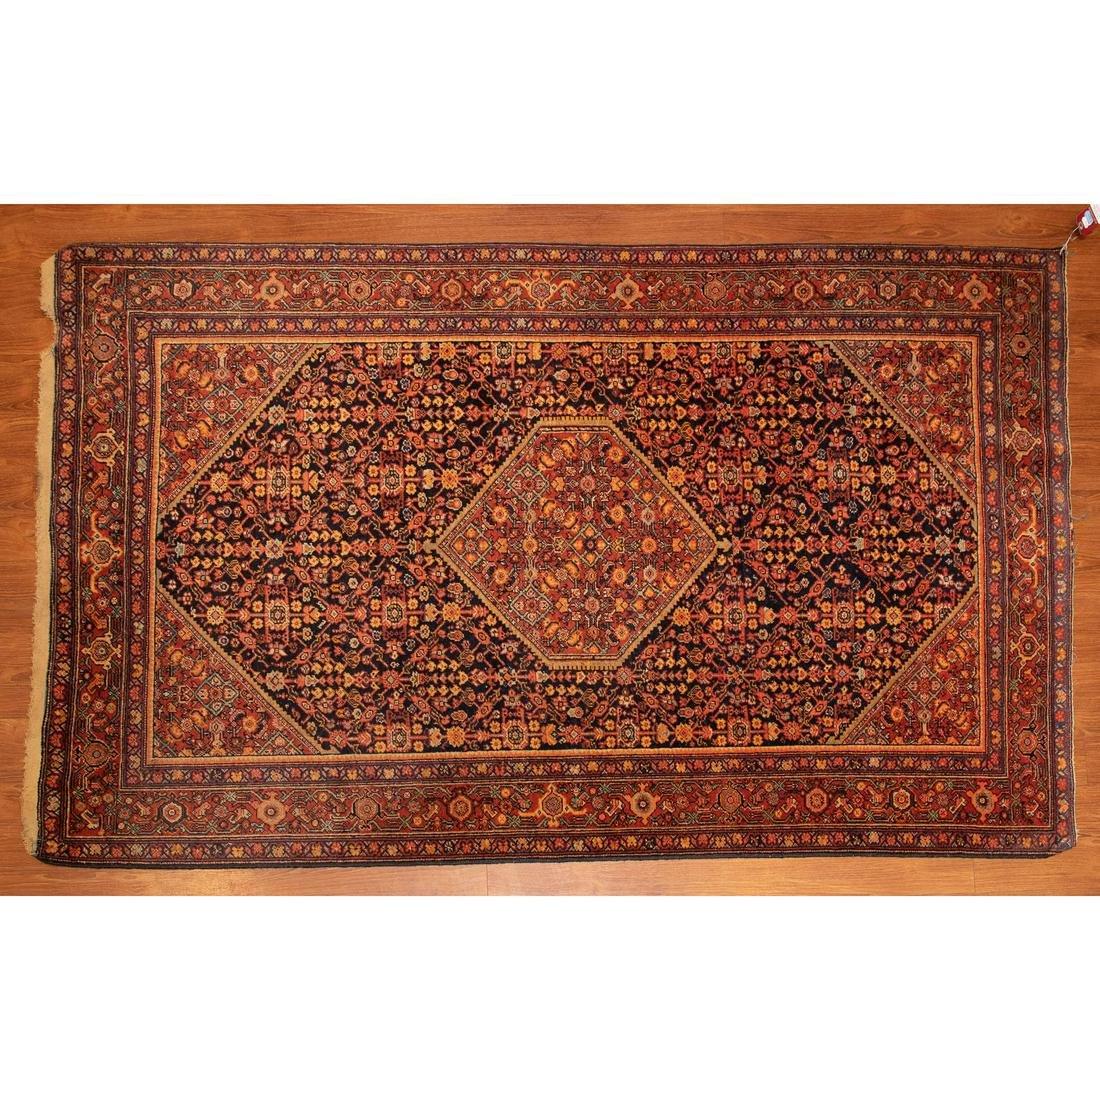 Antique Bijar Rug, Persia, 4.2 x 6.6